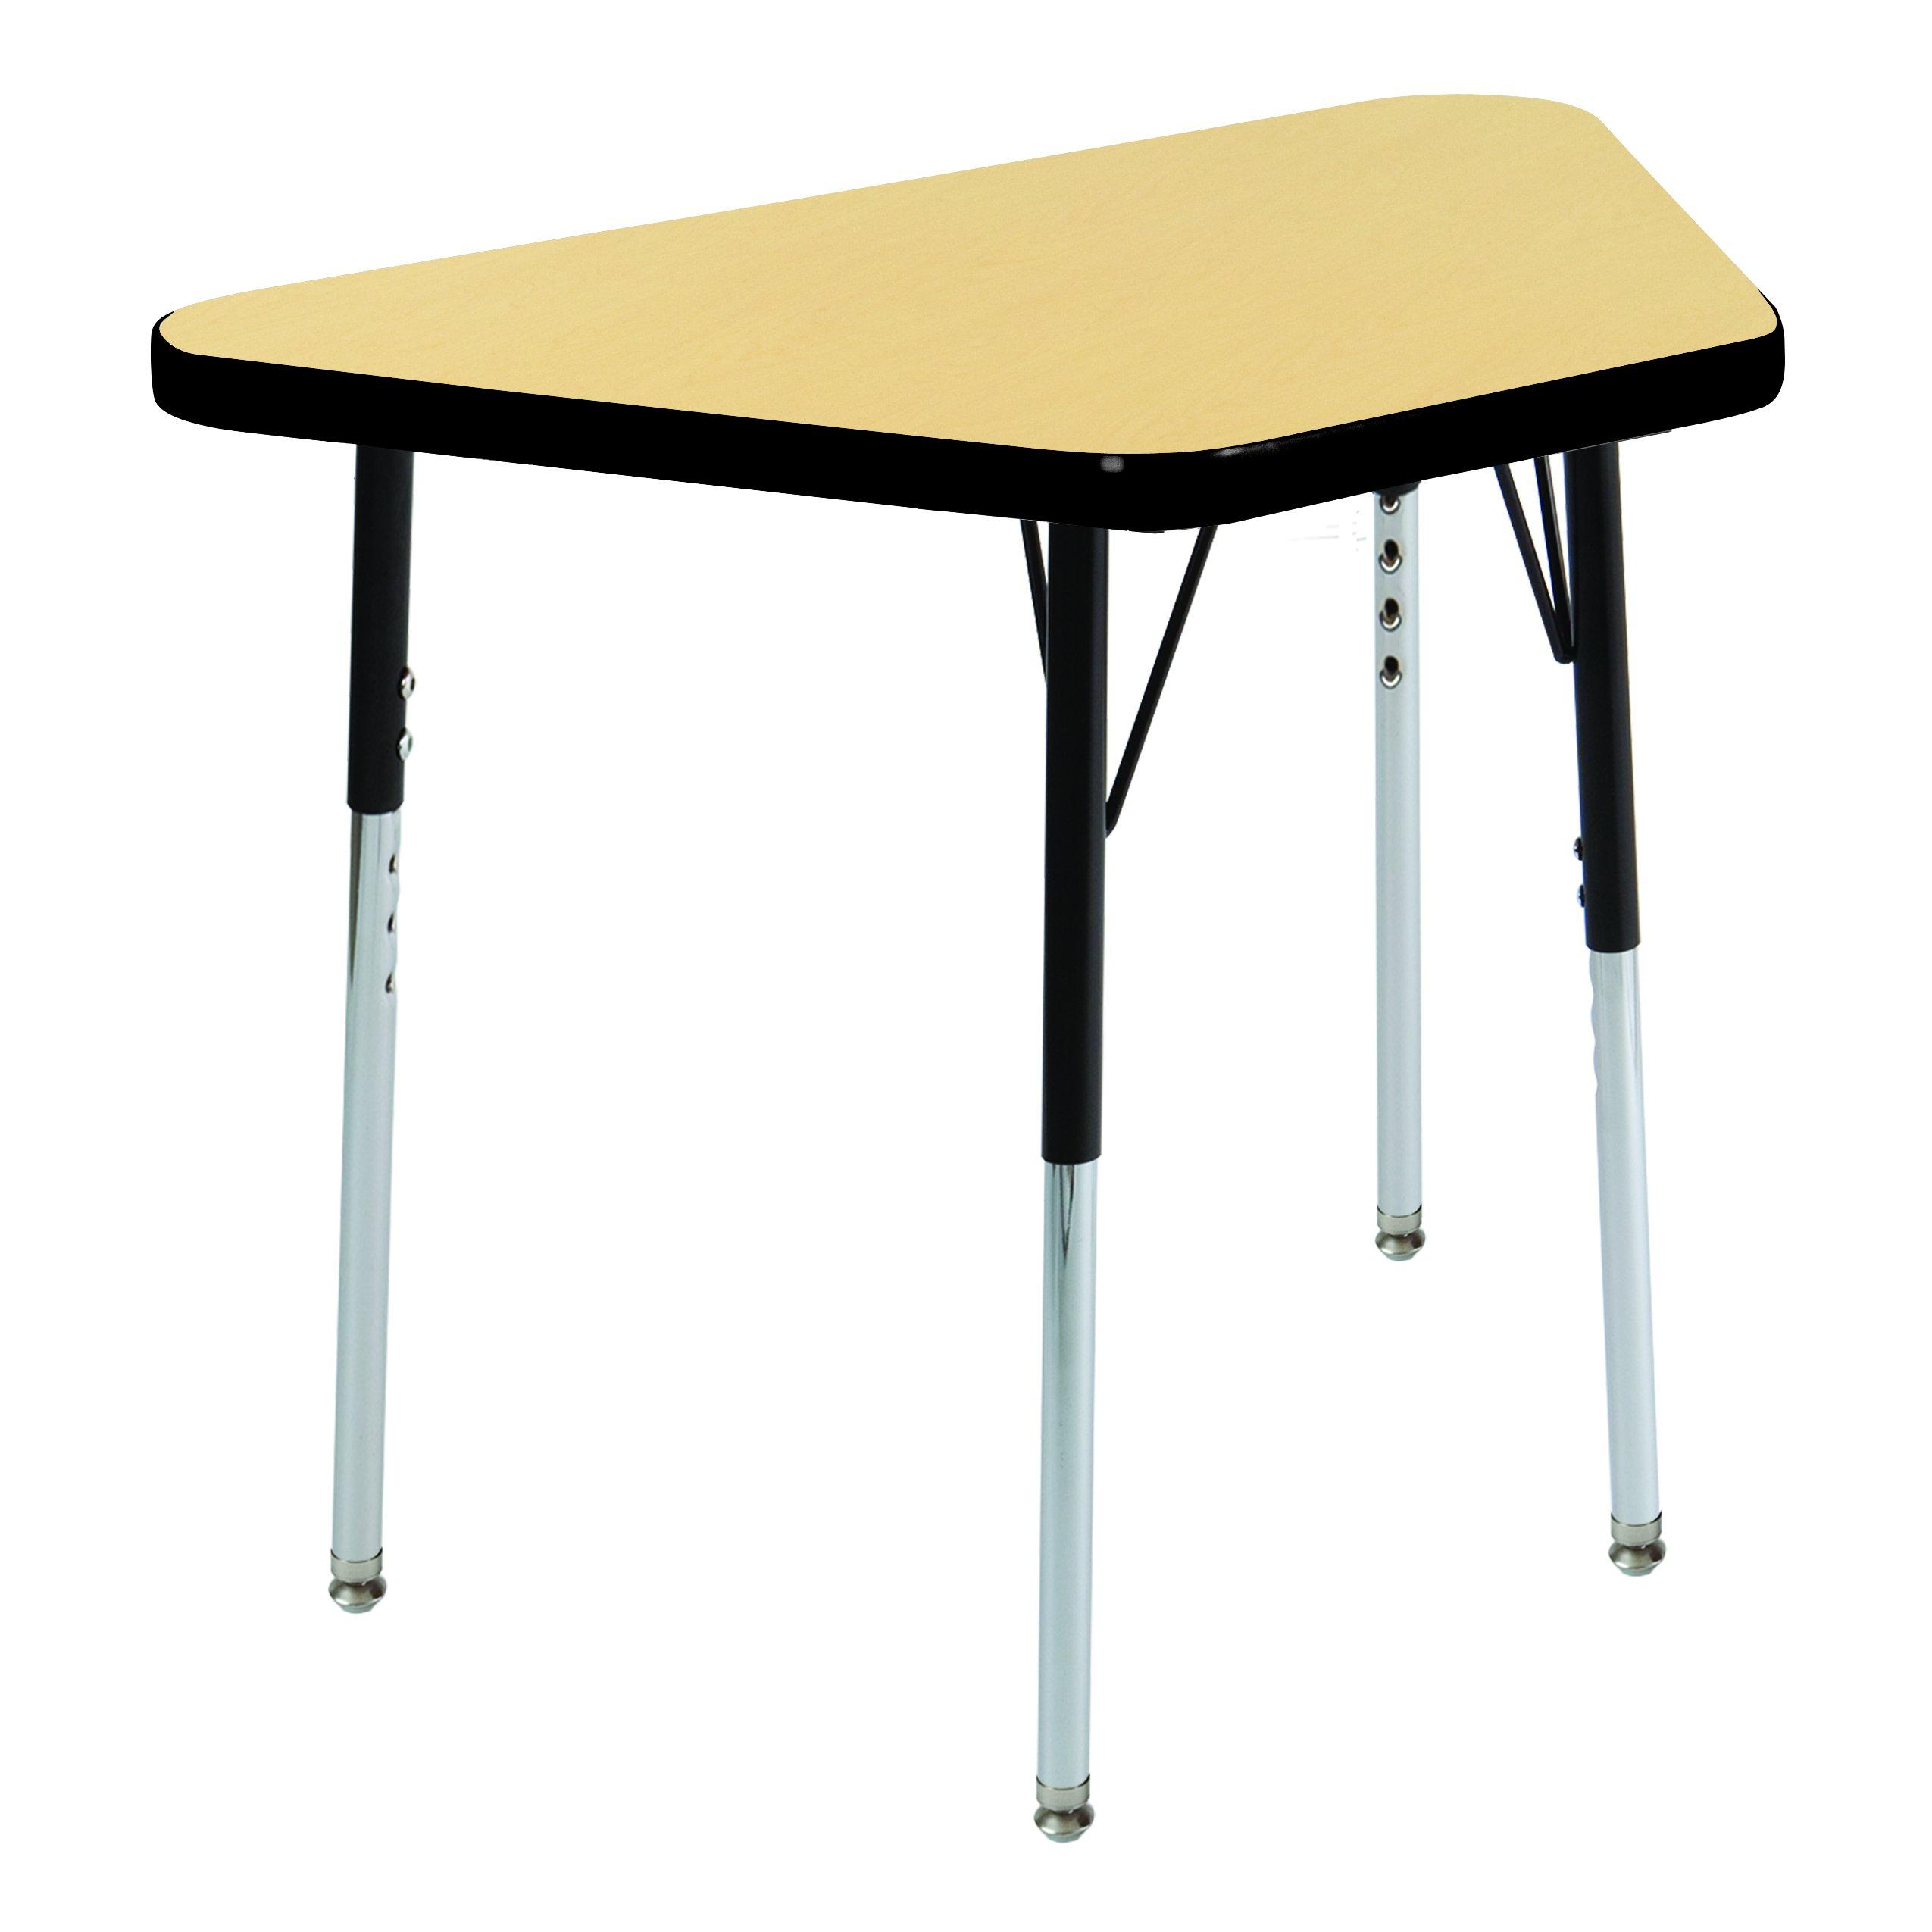 ECR4Kids 18'' x 30'' Trapezoid Activity Table, Toddler Legs w/Swivel Glides (Maple Top/Black Edge/Black Legs)